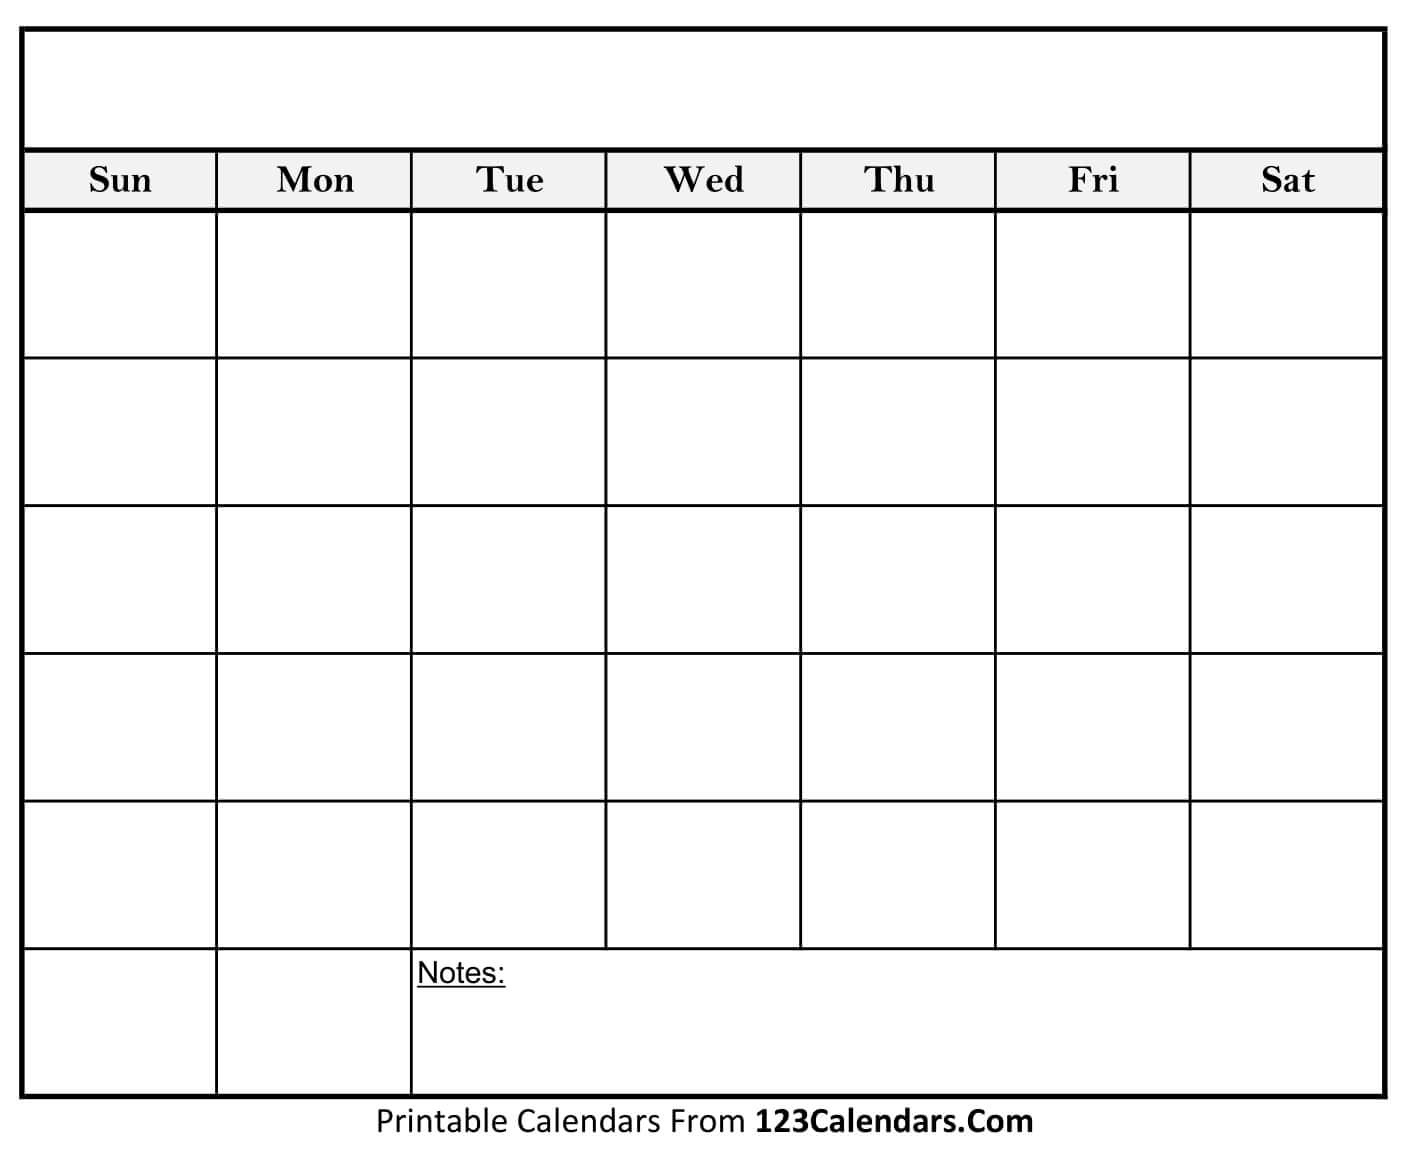 Free Printable Blank Calendar | 123Calendars_A Blank Calendar Template